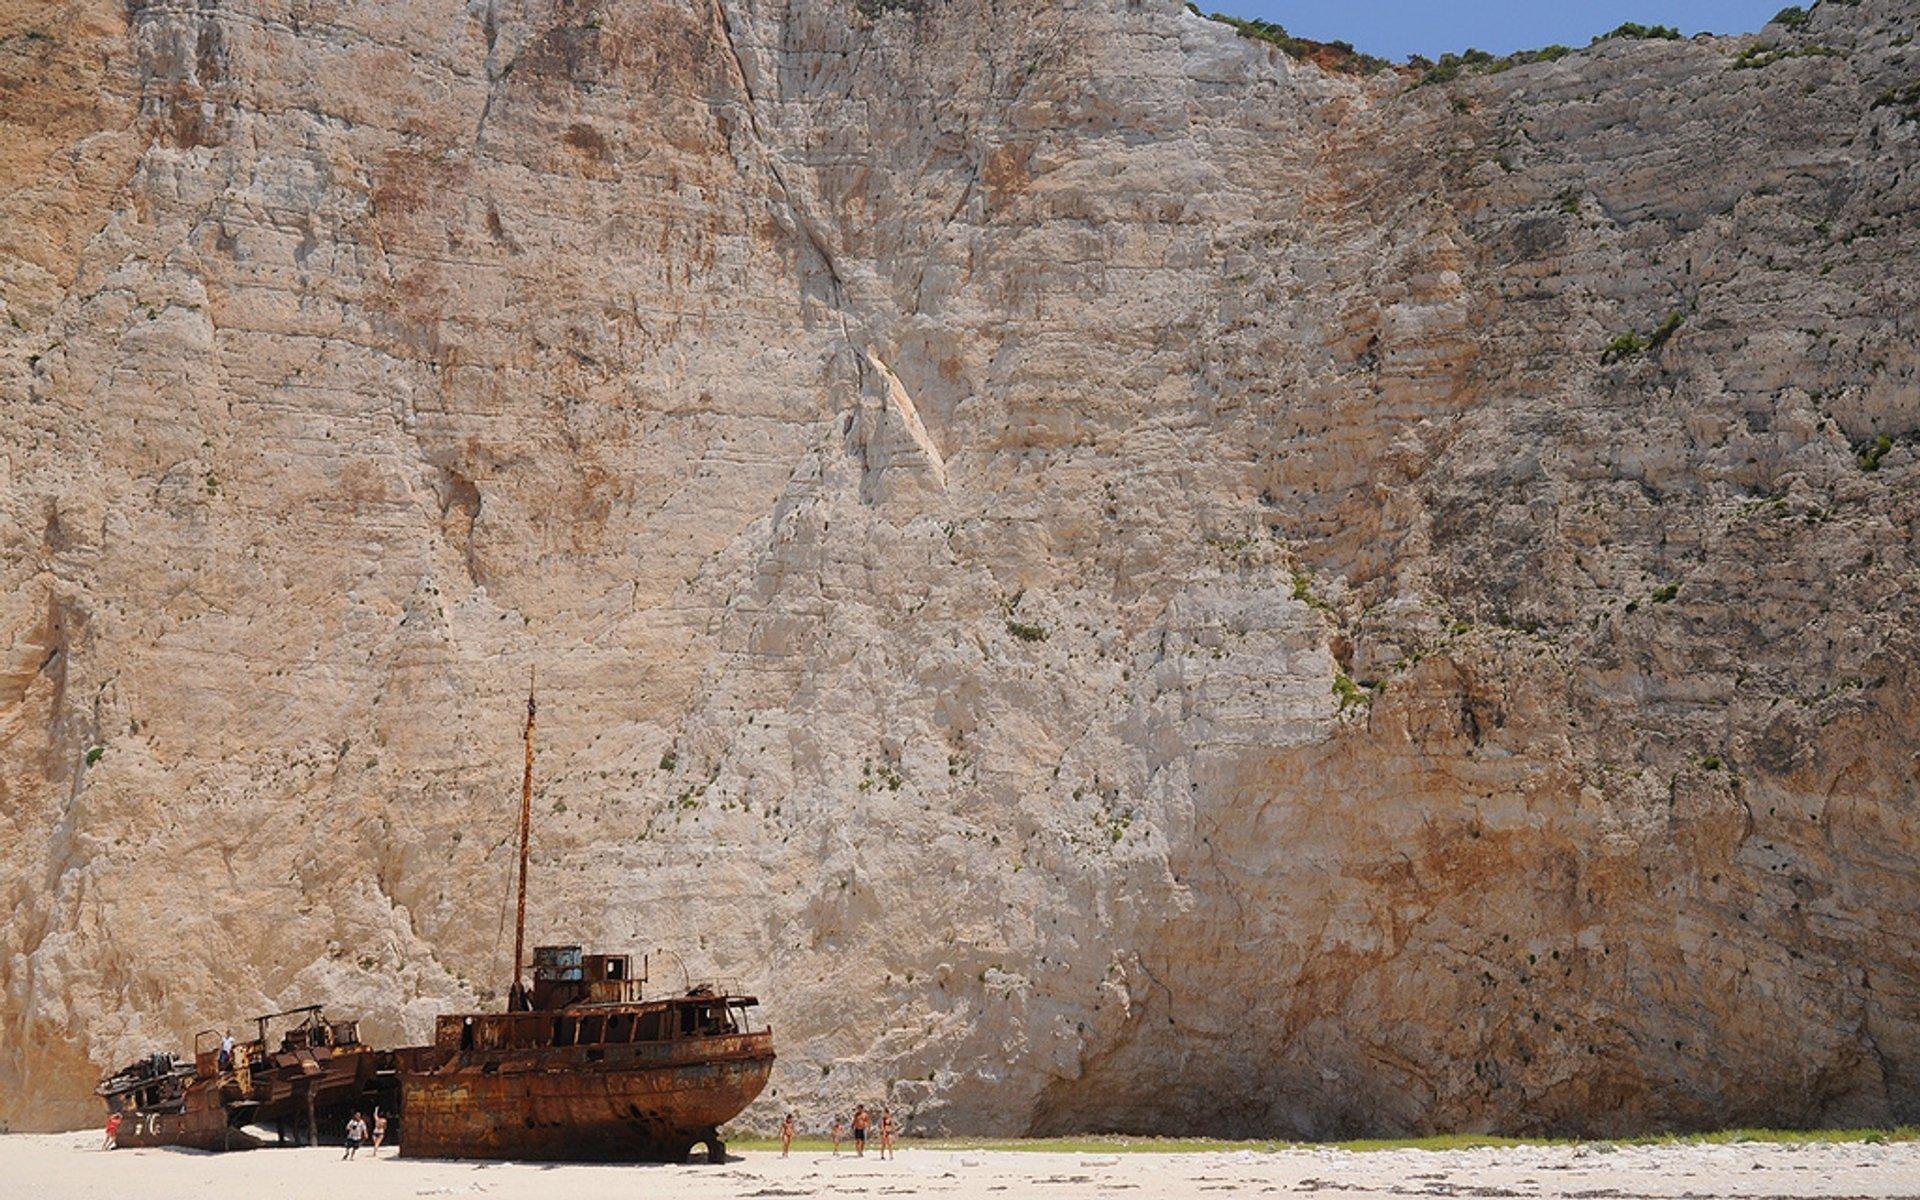 Navagio Shipwreck Beach in Greece - Best Season 2019